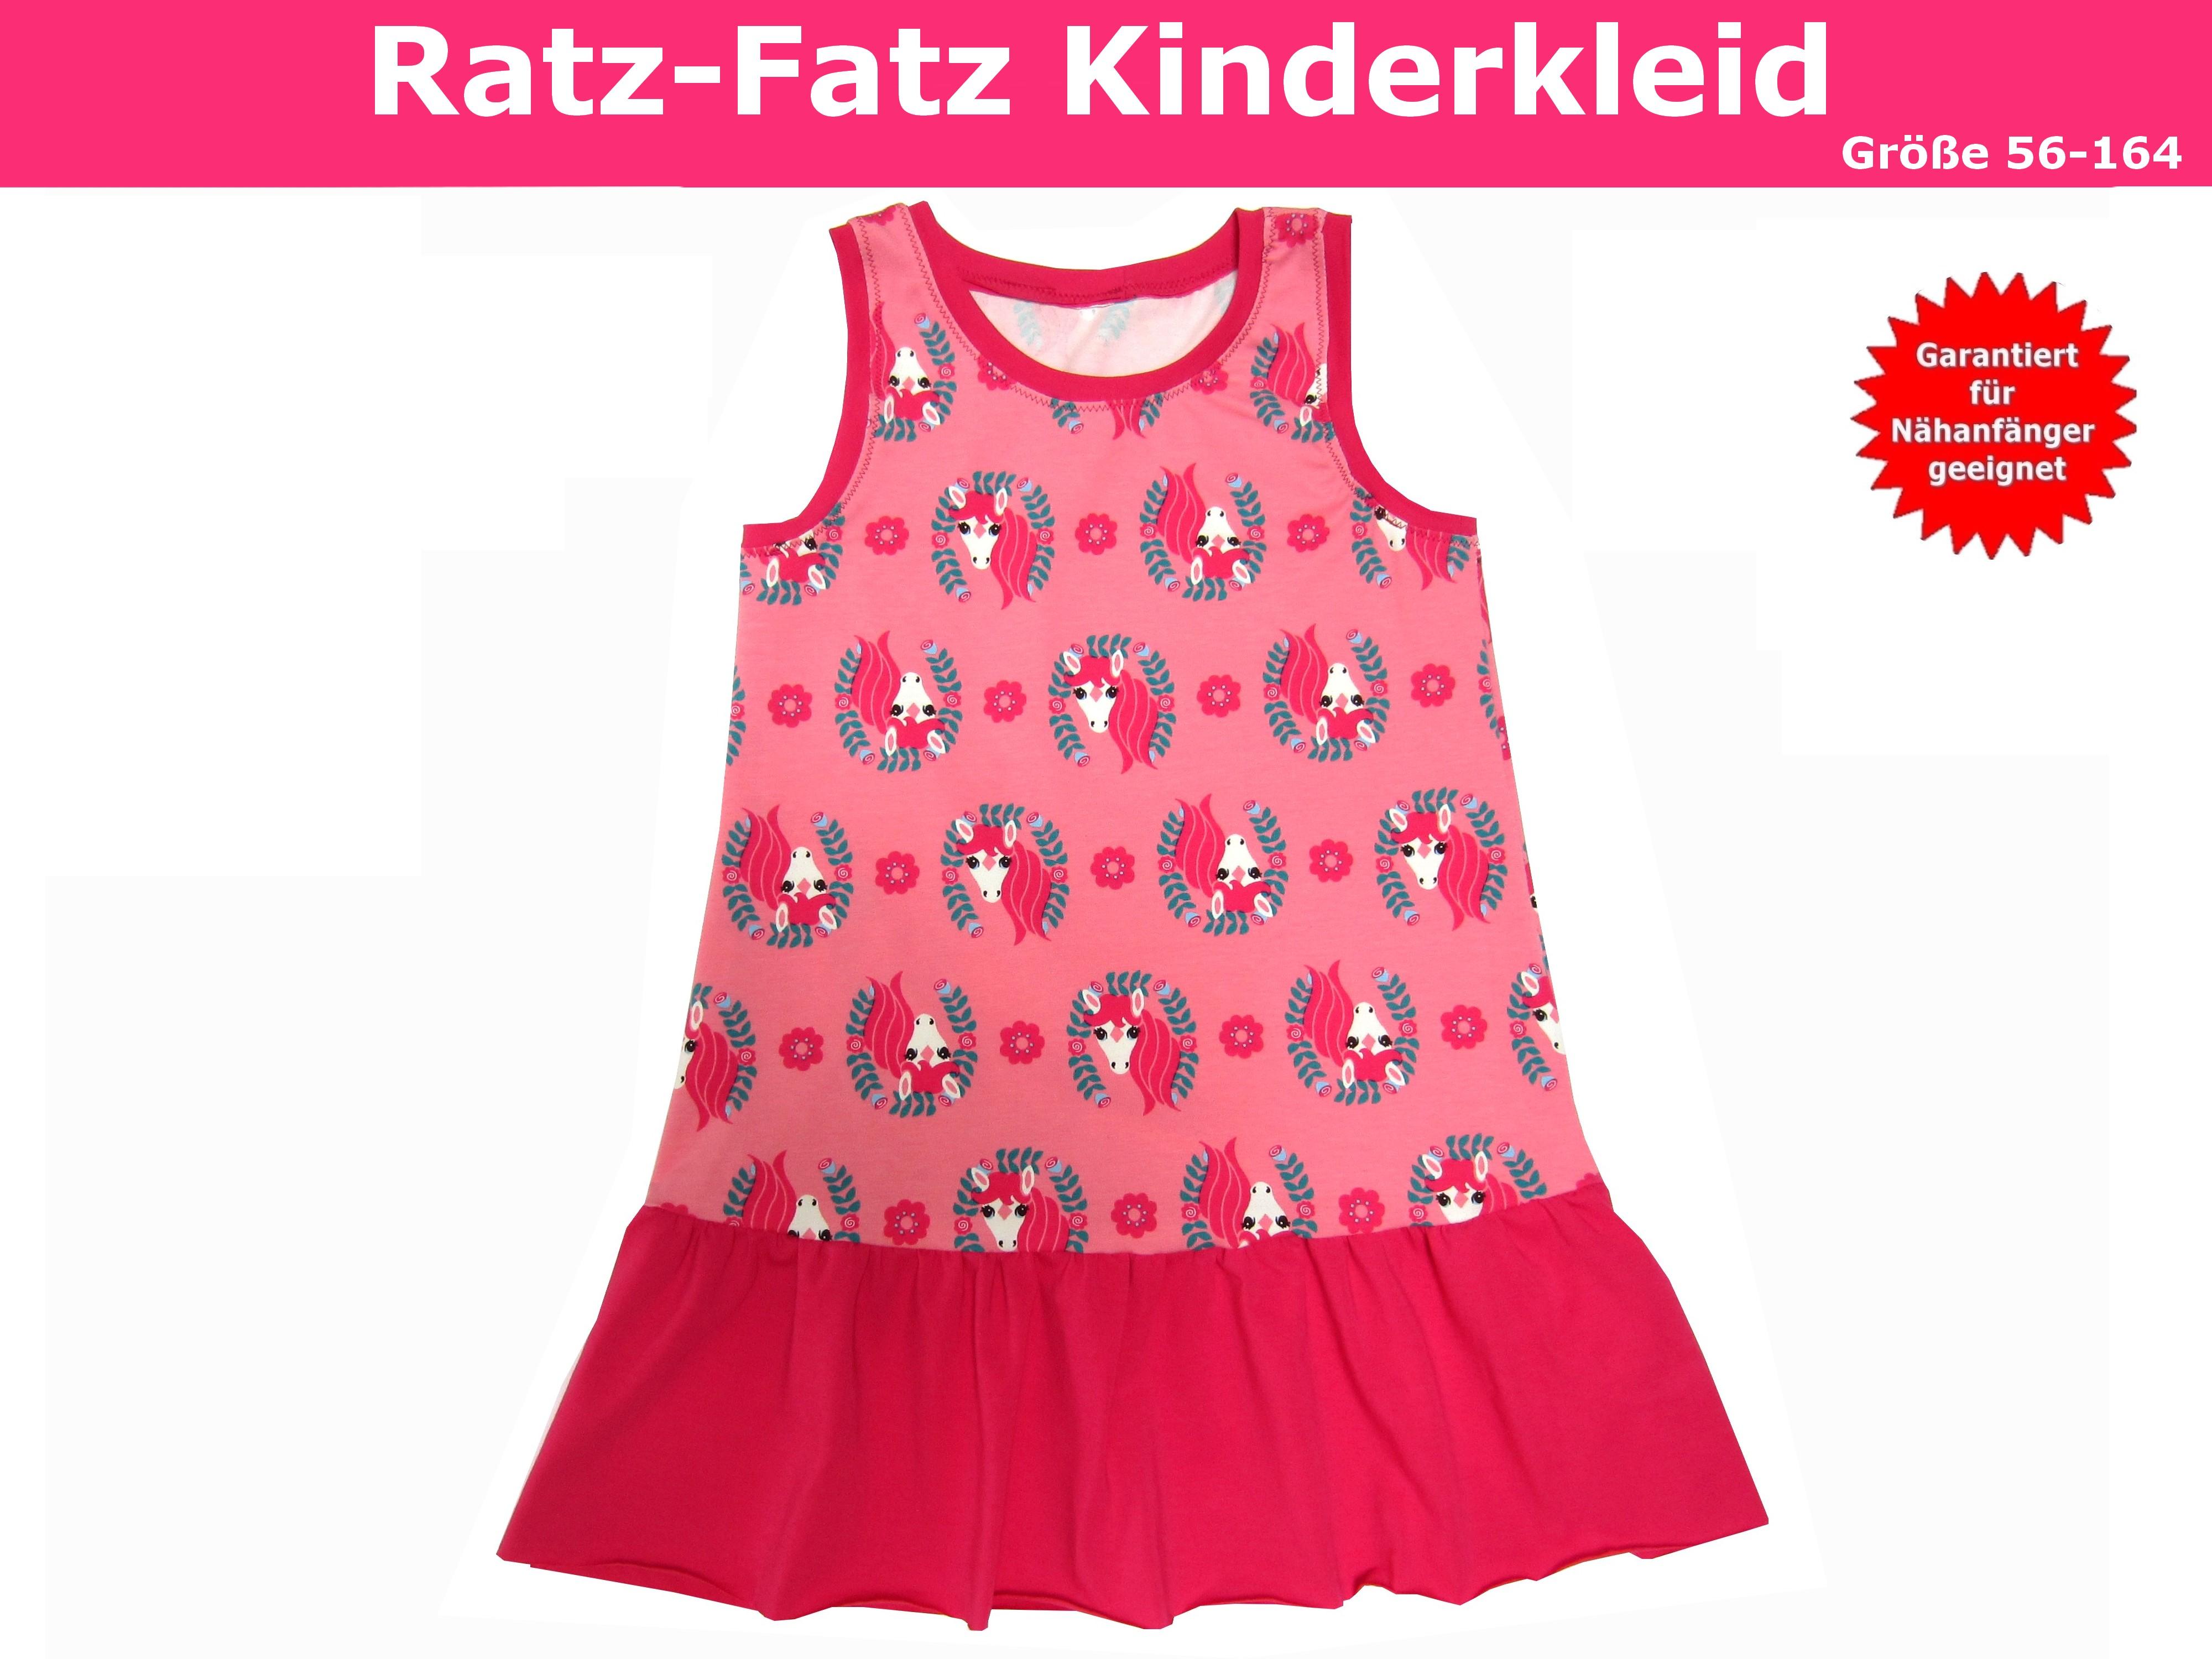 Fatz Kinderkleid Kinderkleid Nähanleitung Ratz Fatz Schnittmusteramp; Ratz Kinderkleid Fatz Ratz Schnittmusteramp; Schnittmusteramp; Nähanleitung vNymwn0O8